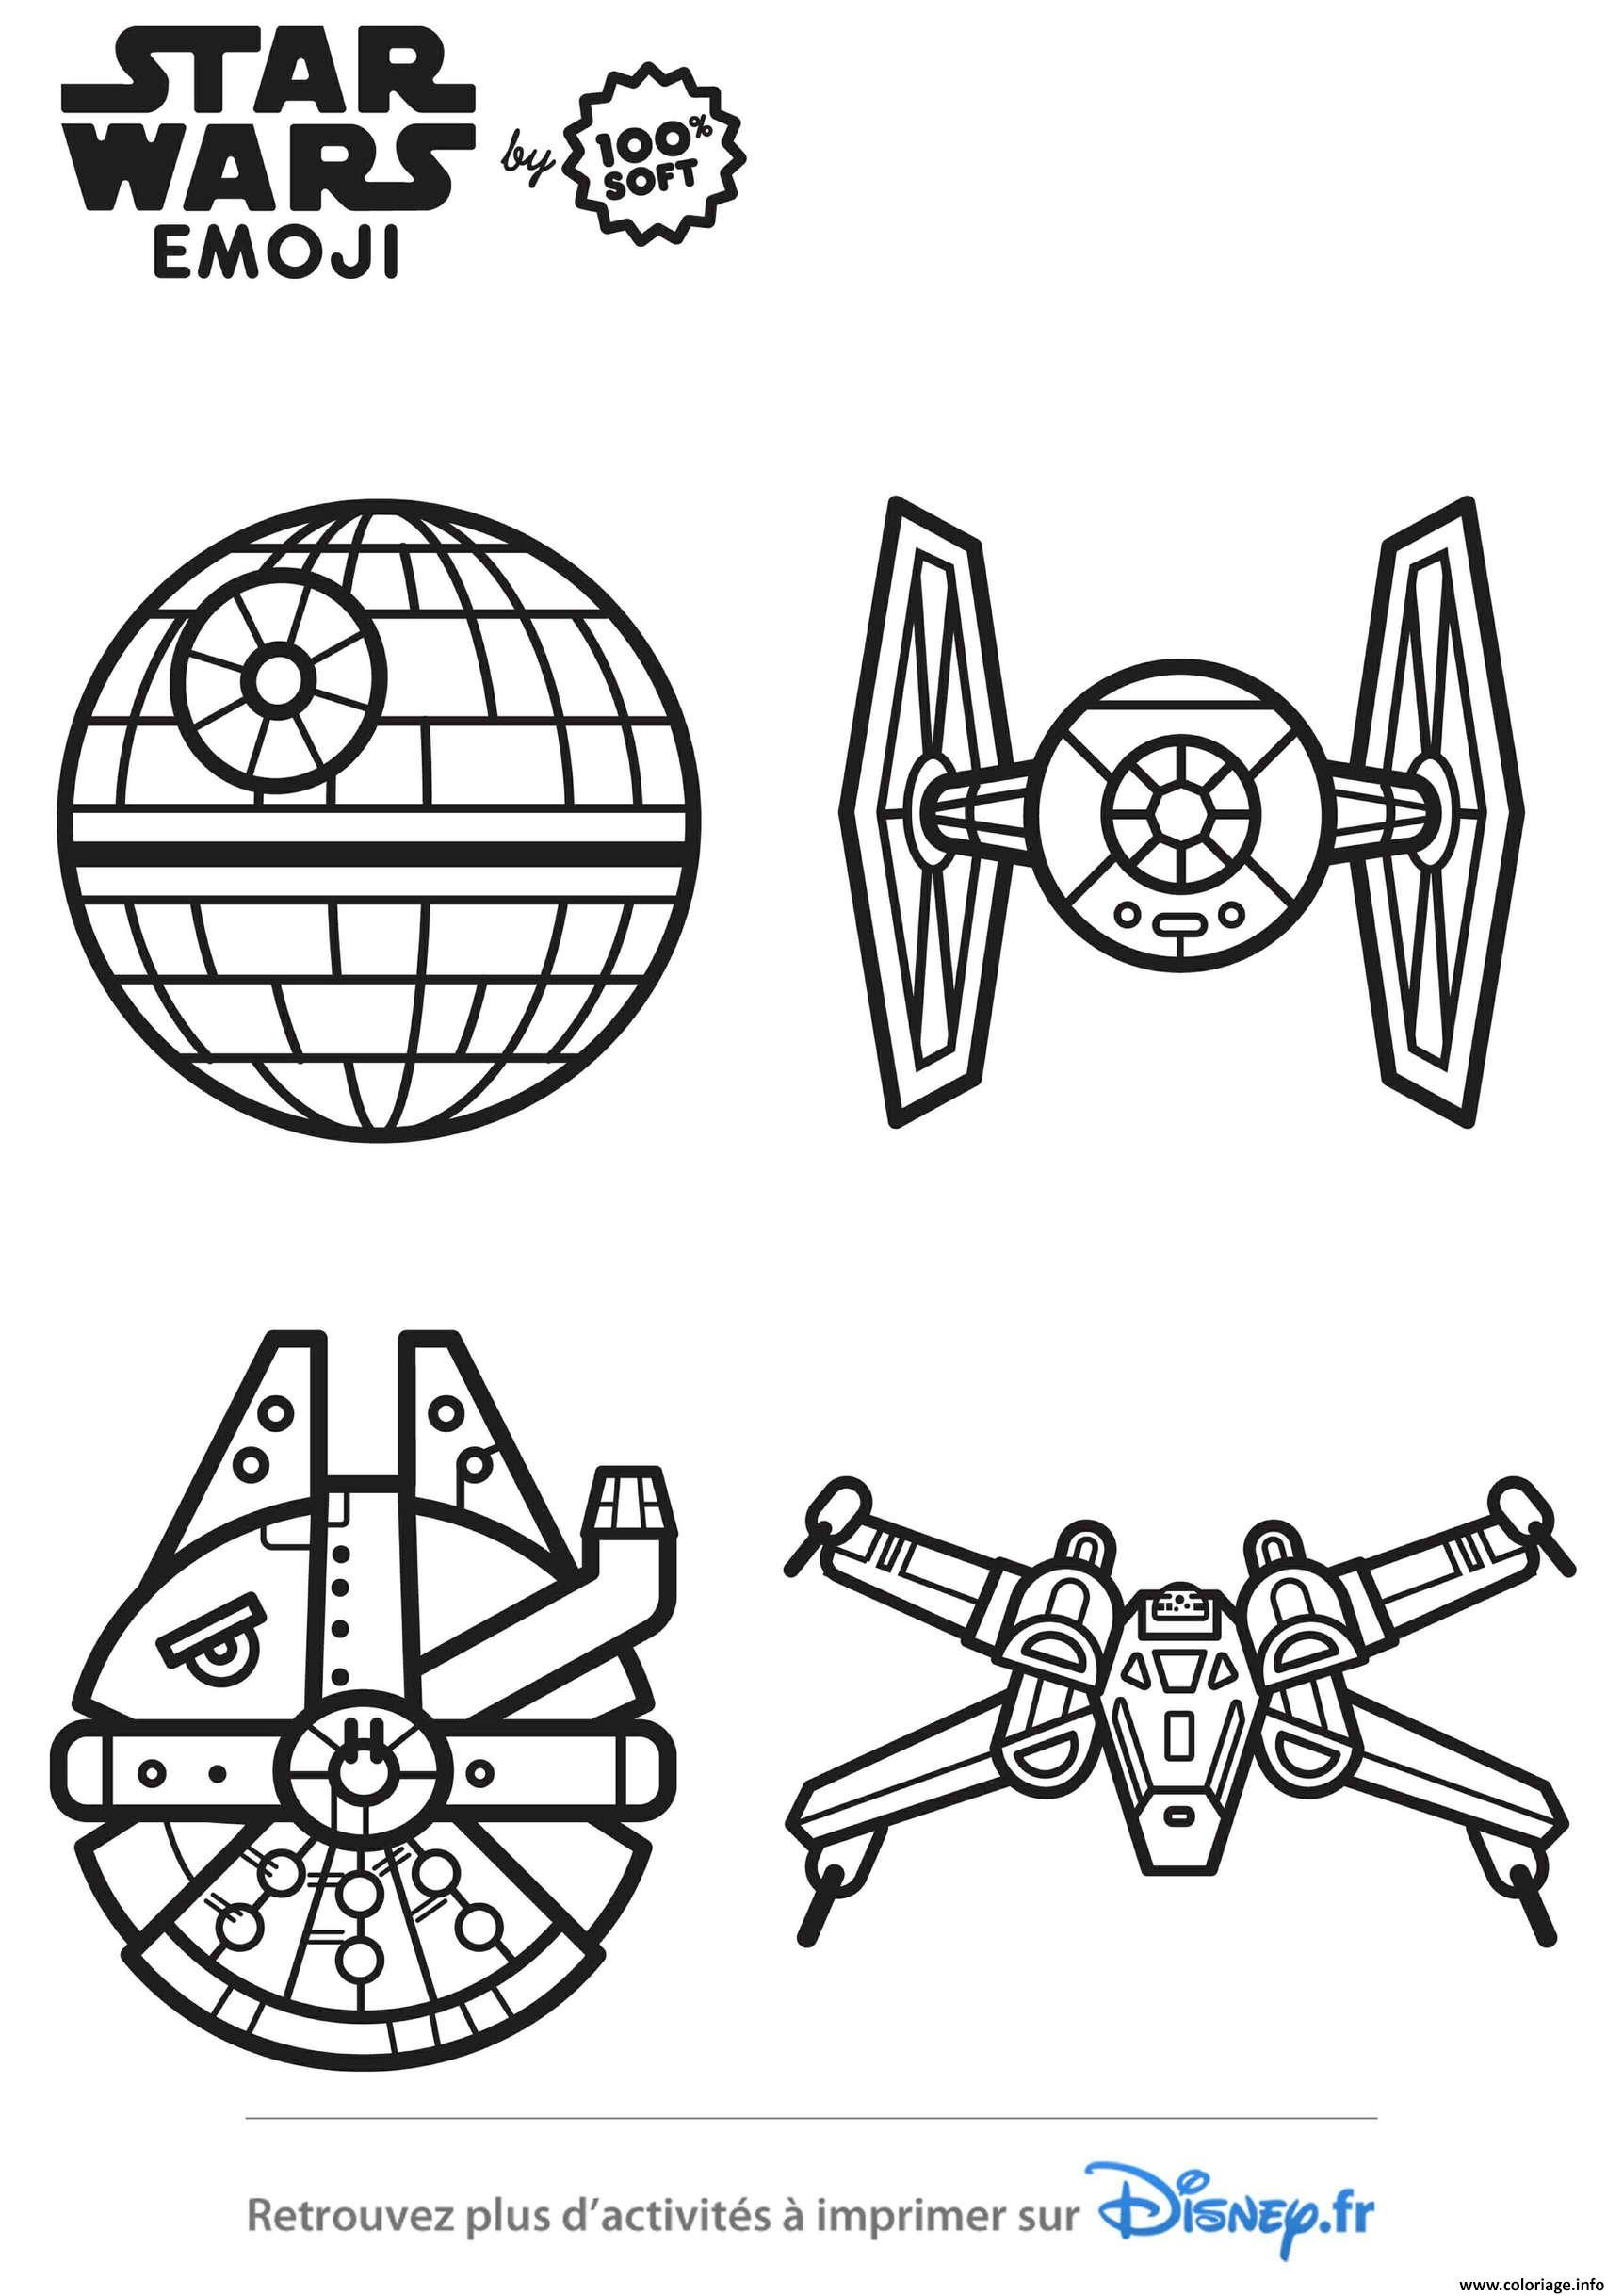 Coloriage Star Wars Vaisseaux Emoji Dessin Star Wars à Imprimer